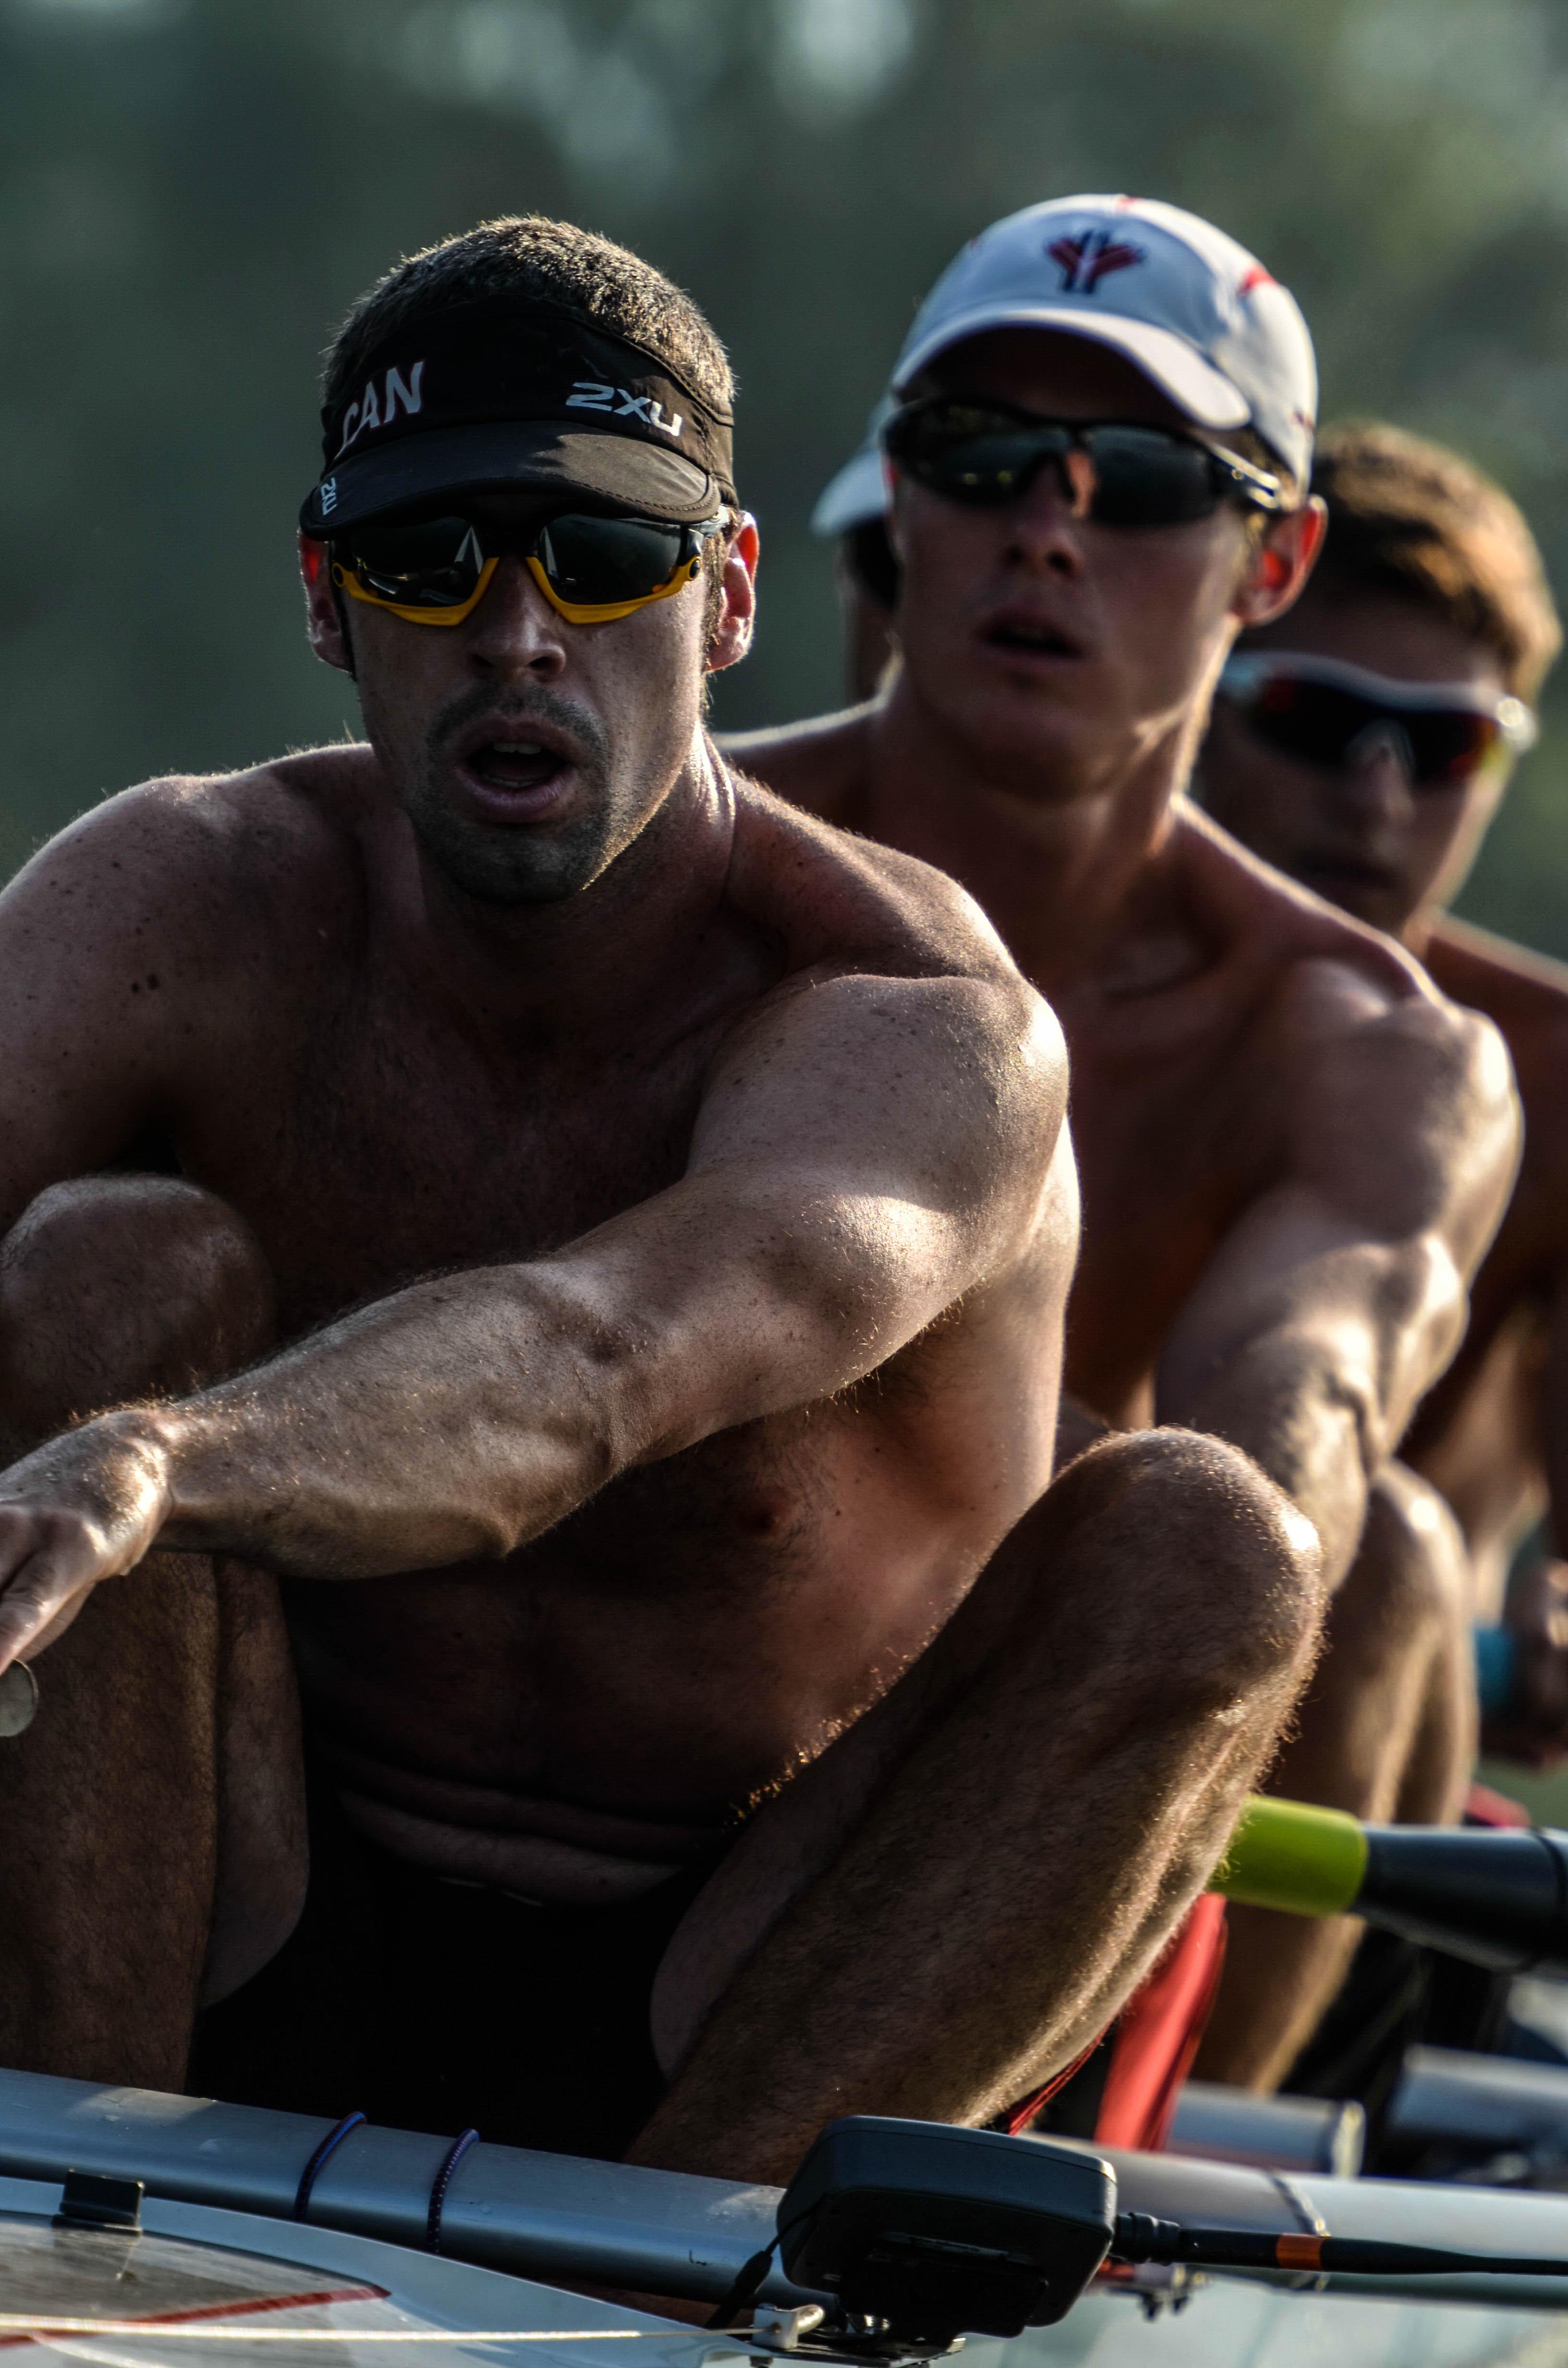 Training in Italy